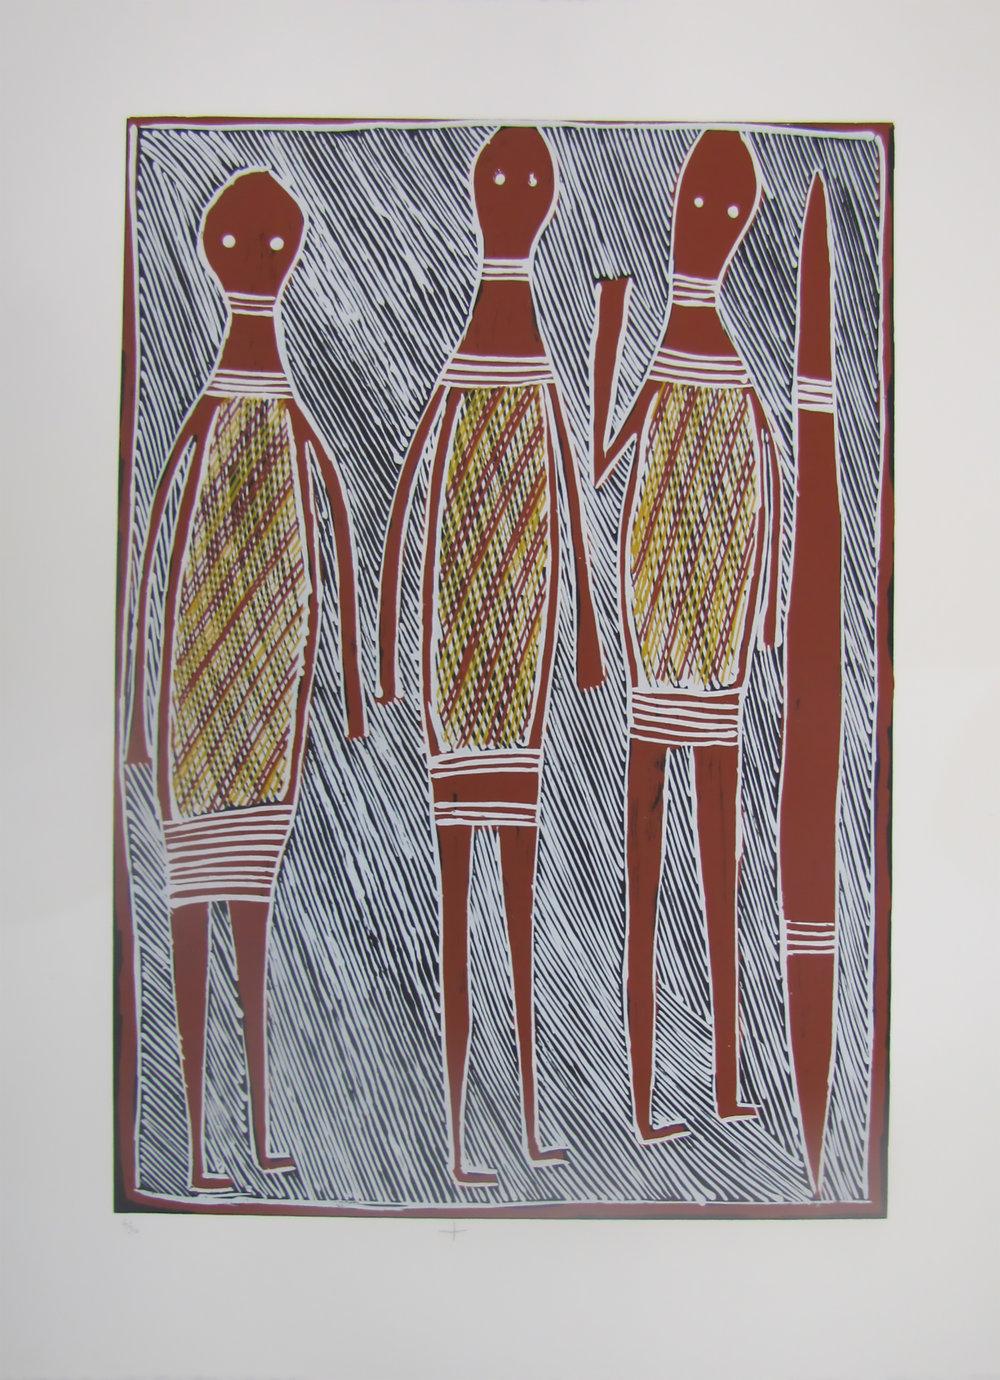 Philip Gudthaygudthay,  Wagilag Ga Wititj Dhawu. 2016  Silkscreen. Ed 9/30,  59 x 42 cm , $350 (unframed)  $550 (framed)   Editions 6/30, 7/30 & 8/30 (unframed) also available